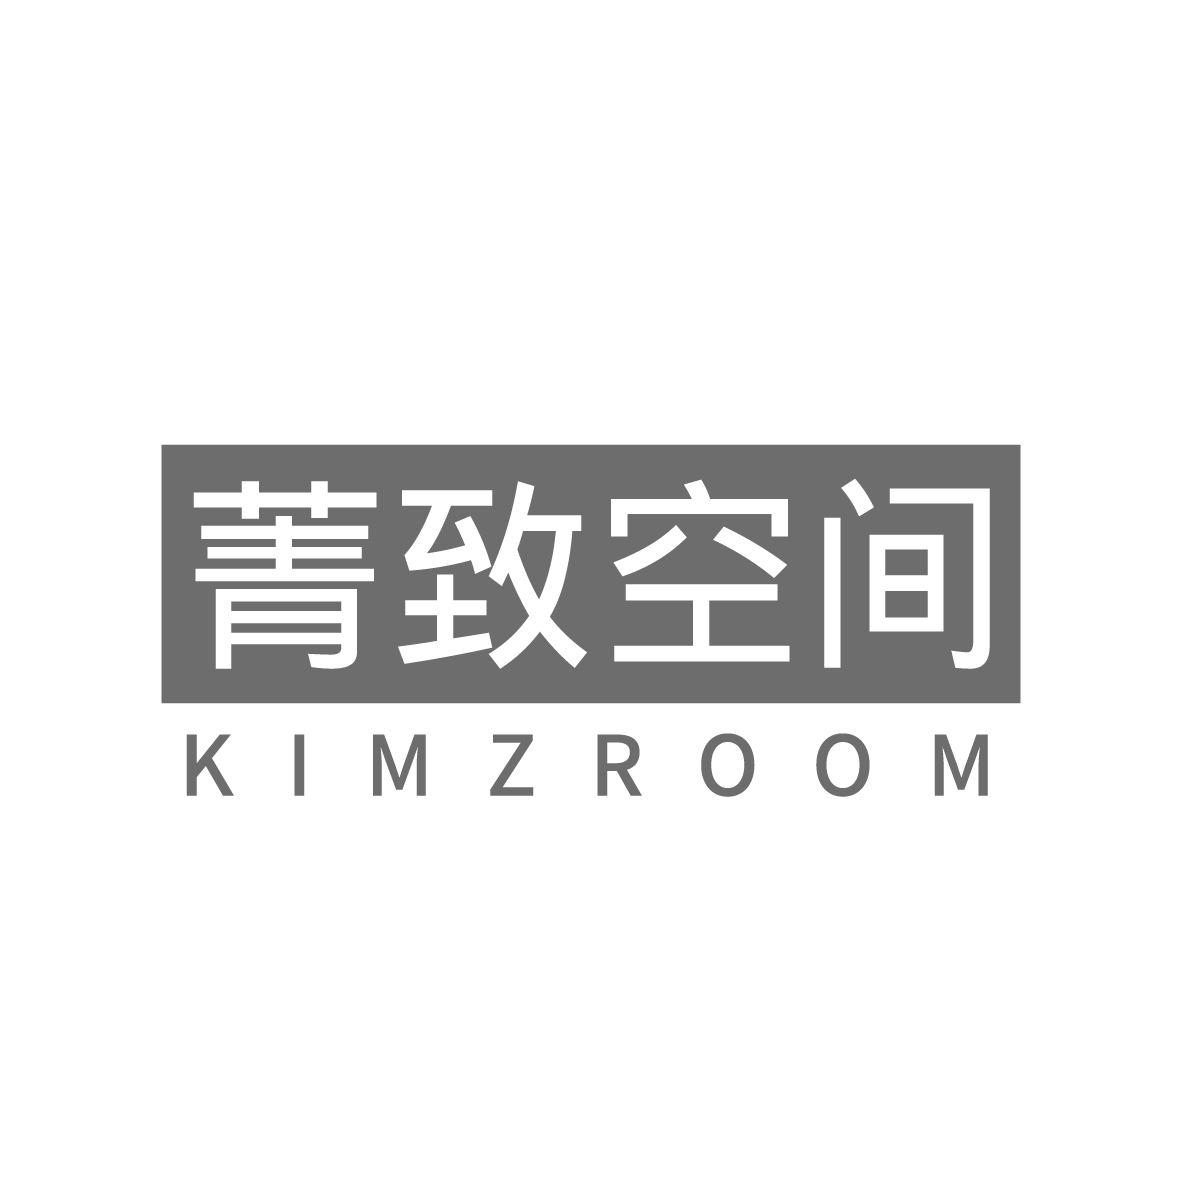 菁致空间KIMZROOM